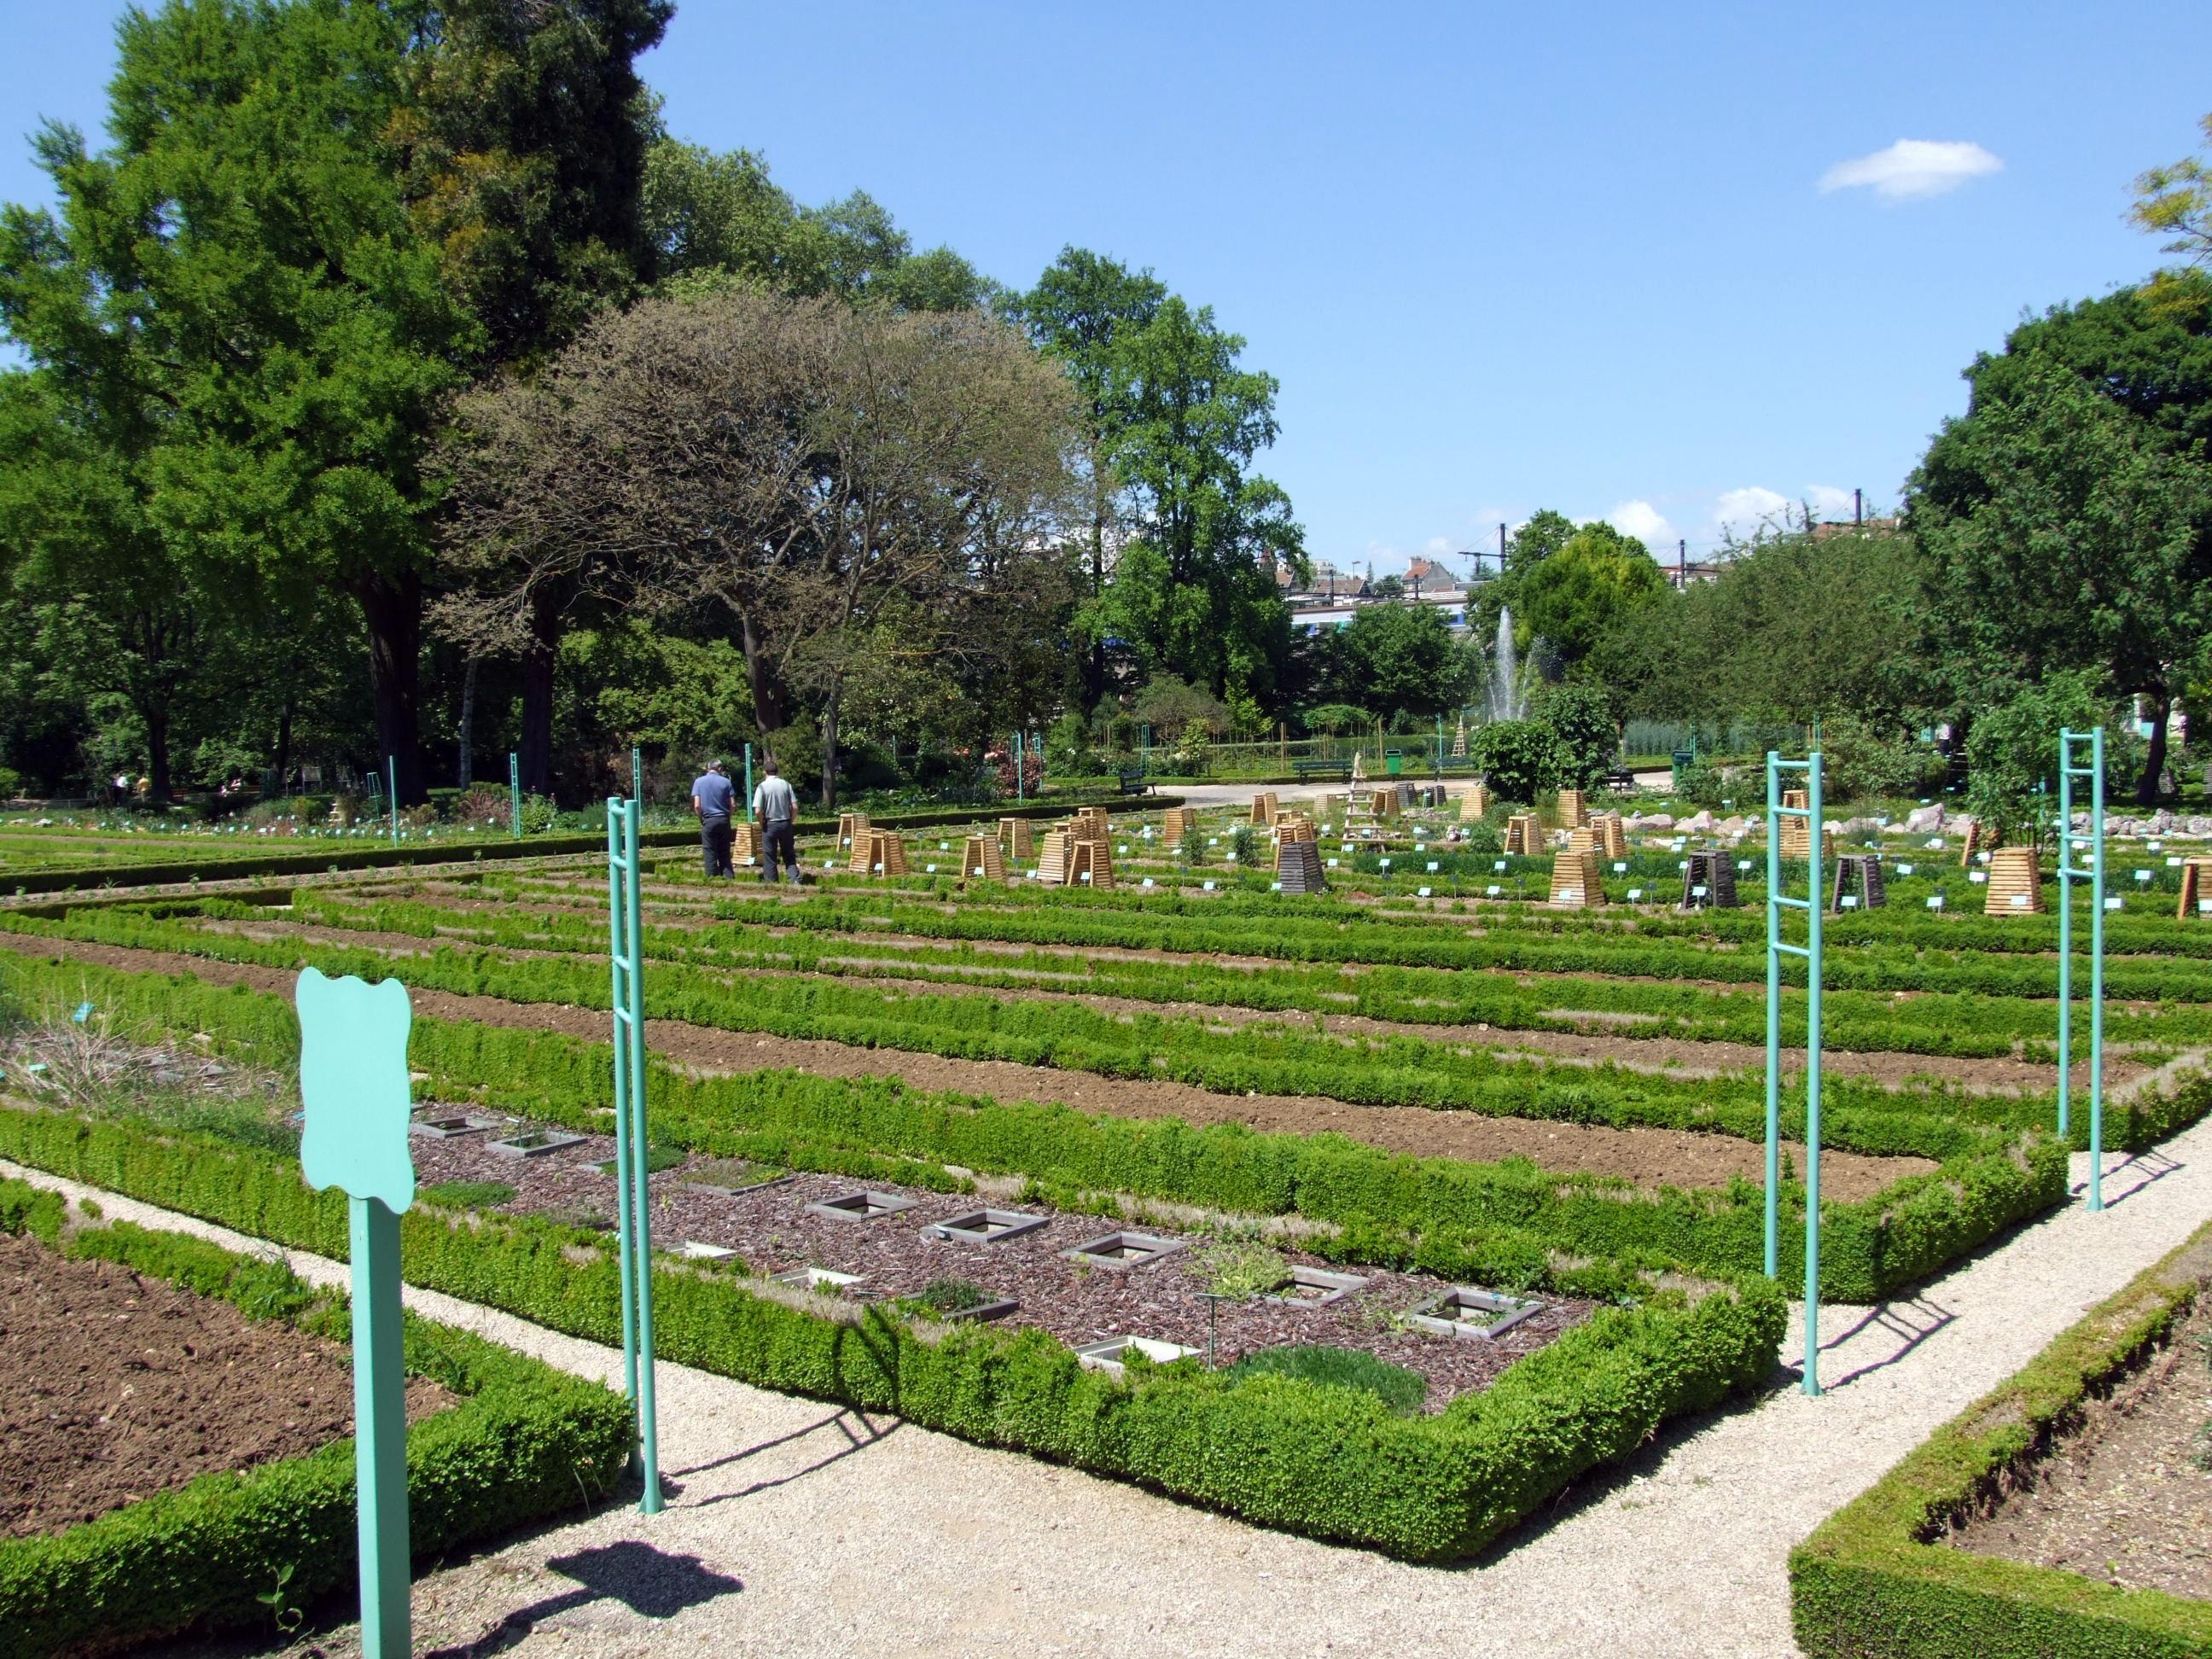 Jardin botanique de l 39 arquebuse wikiwand for Jardin wikipedia